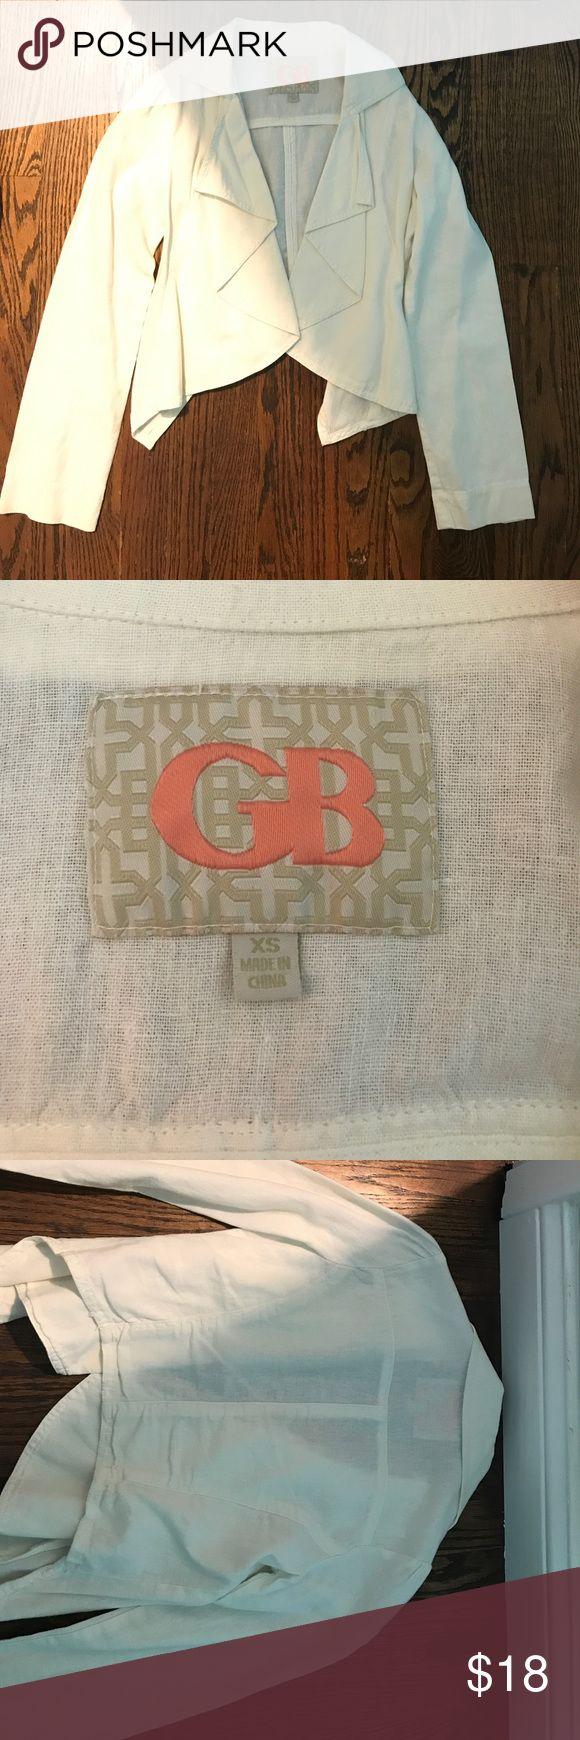 Gianni Bini linen cardigan Gianni Bini linen cardigan. Excellent condition Gianni Bini Sweaters Shrugs & Ponchos